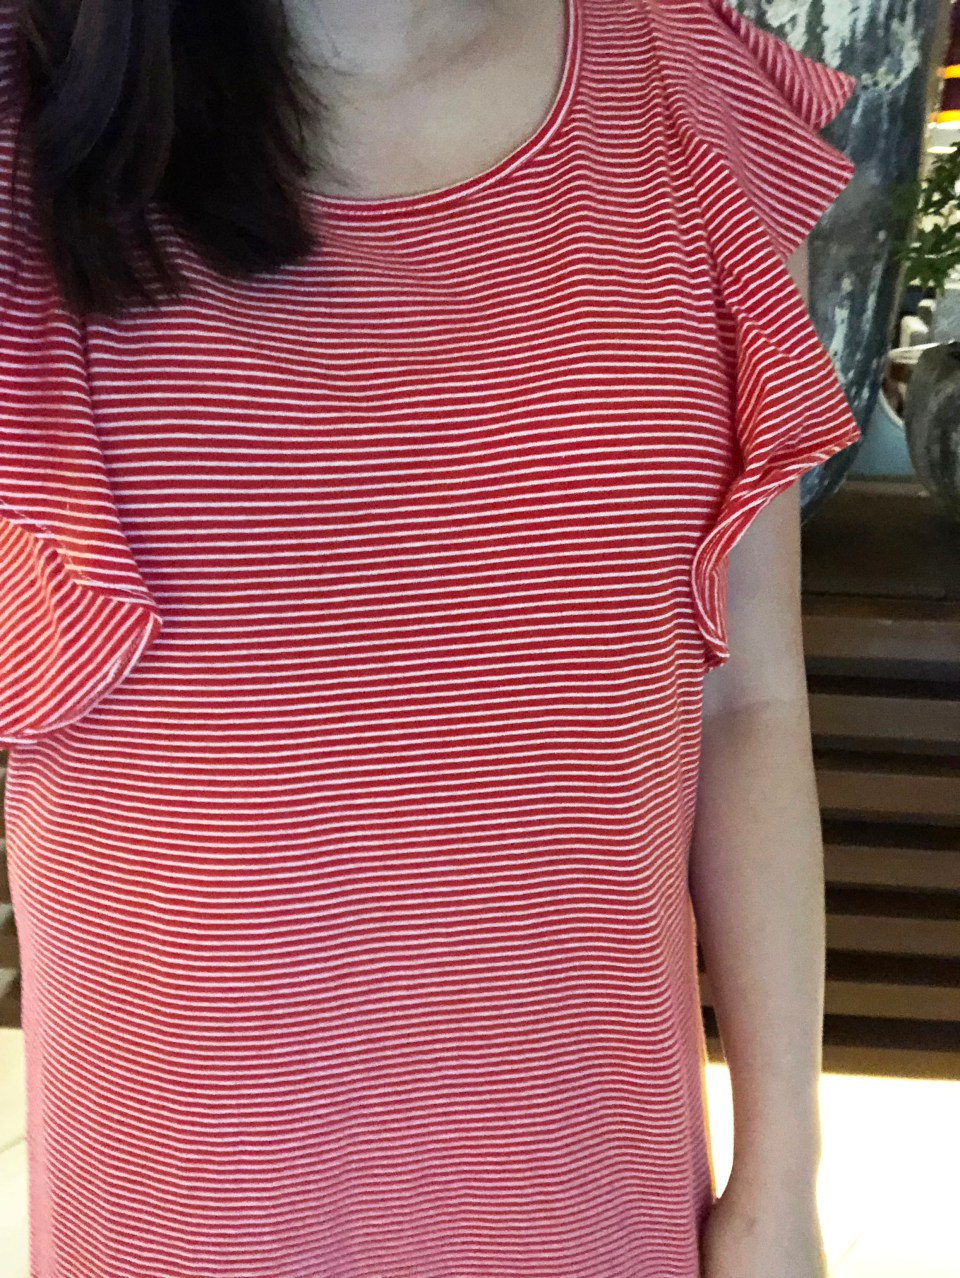 Red & White Striped T-Shirt Dress 9